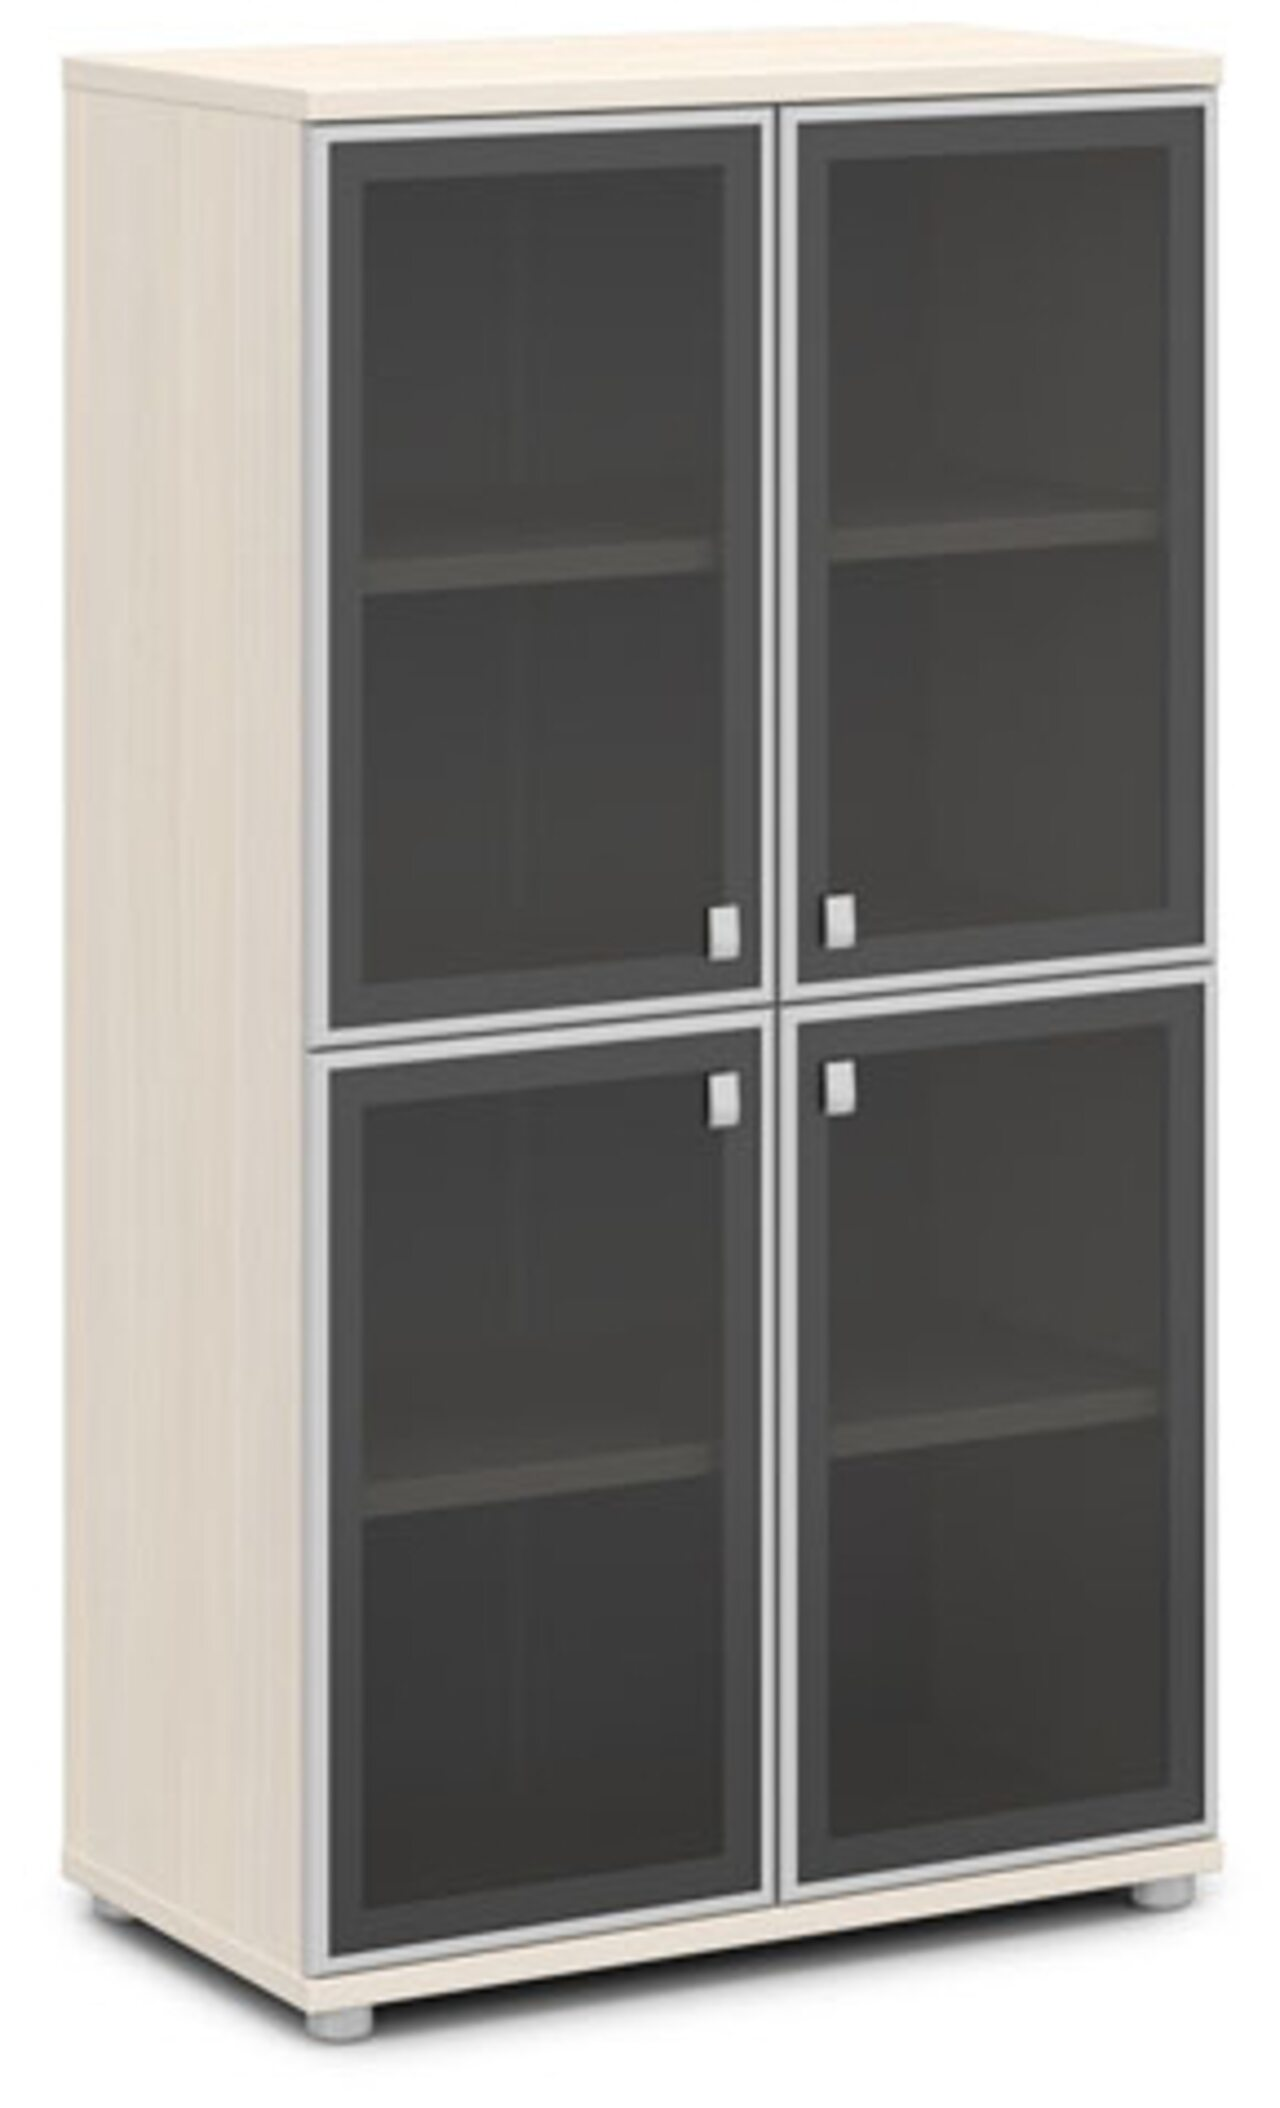 Шкаф со стеклом в алюминиевом профиле  Vasanta 82x44x149 - фото 7